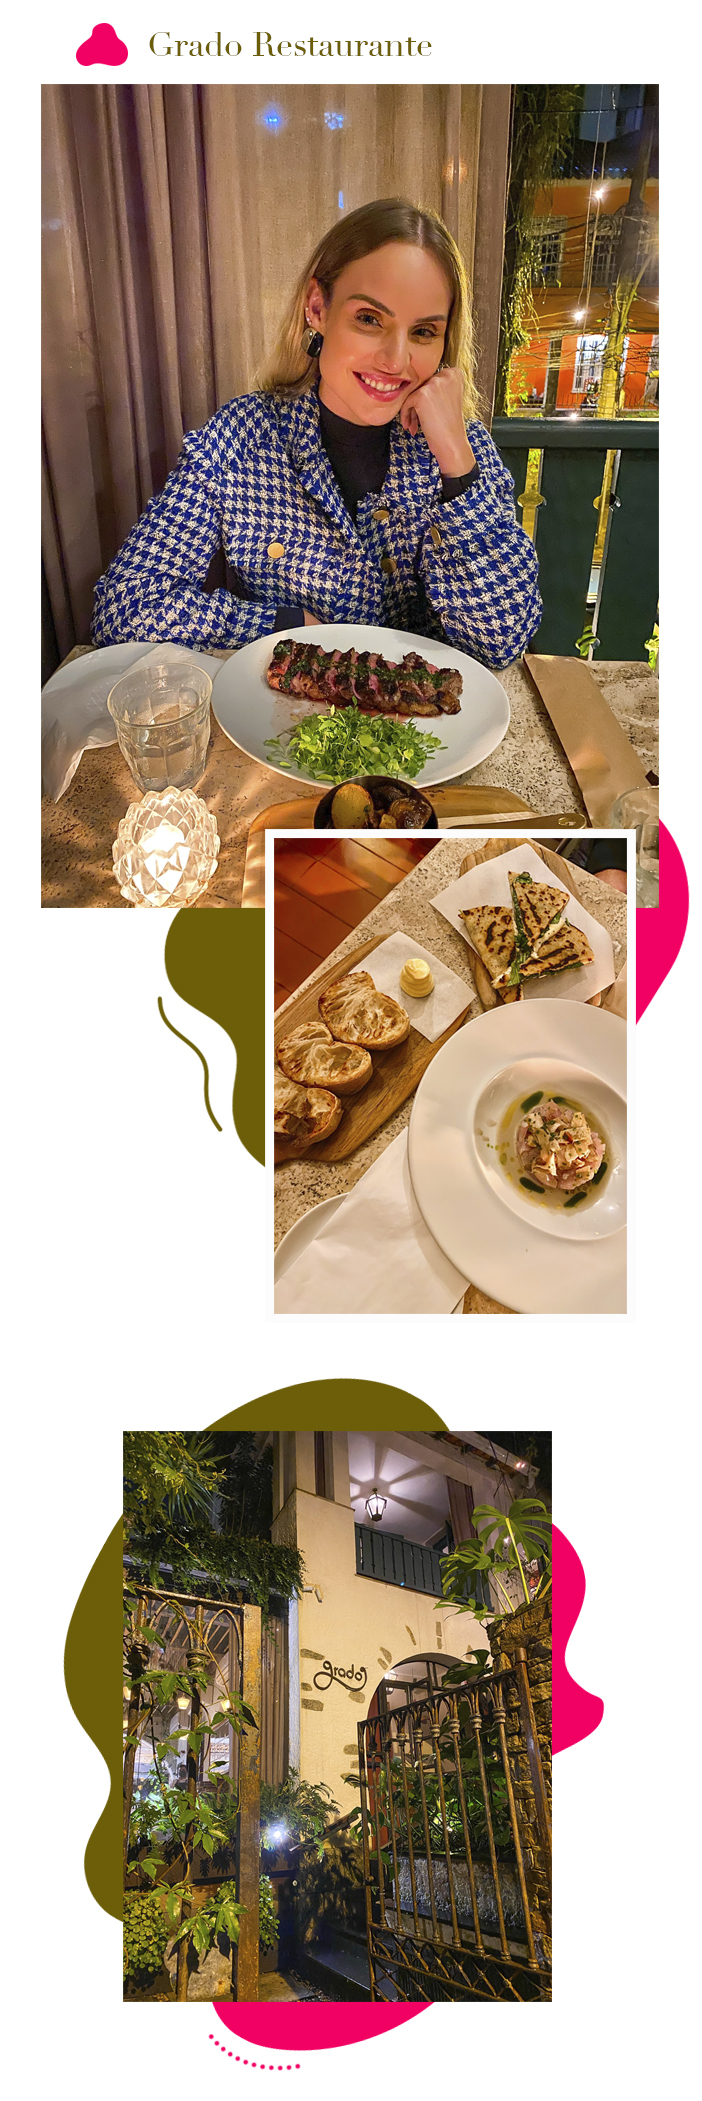 Diário de Bordo - Layla no Fairmont Rio - Grado Restaurante